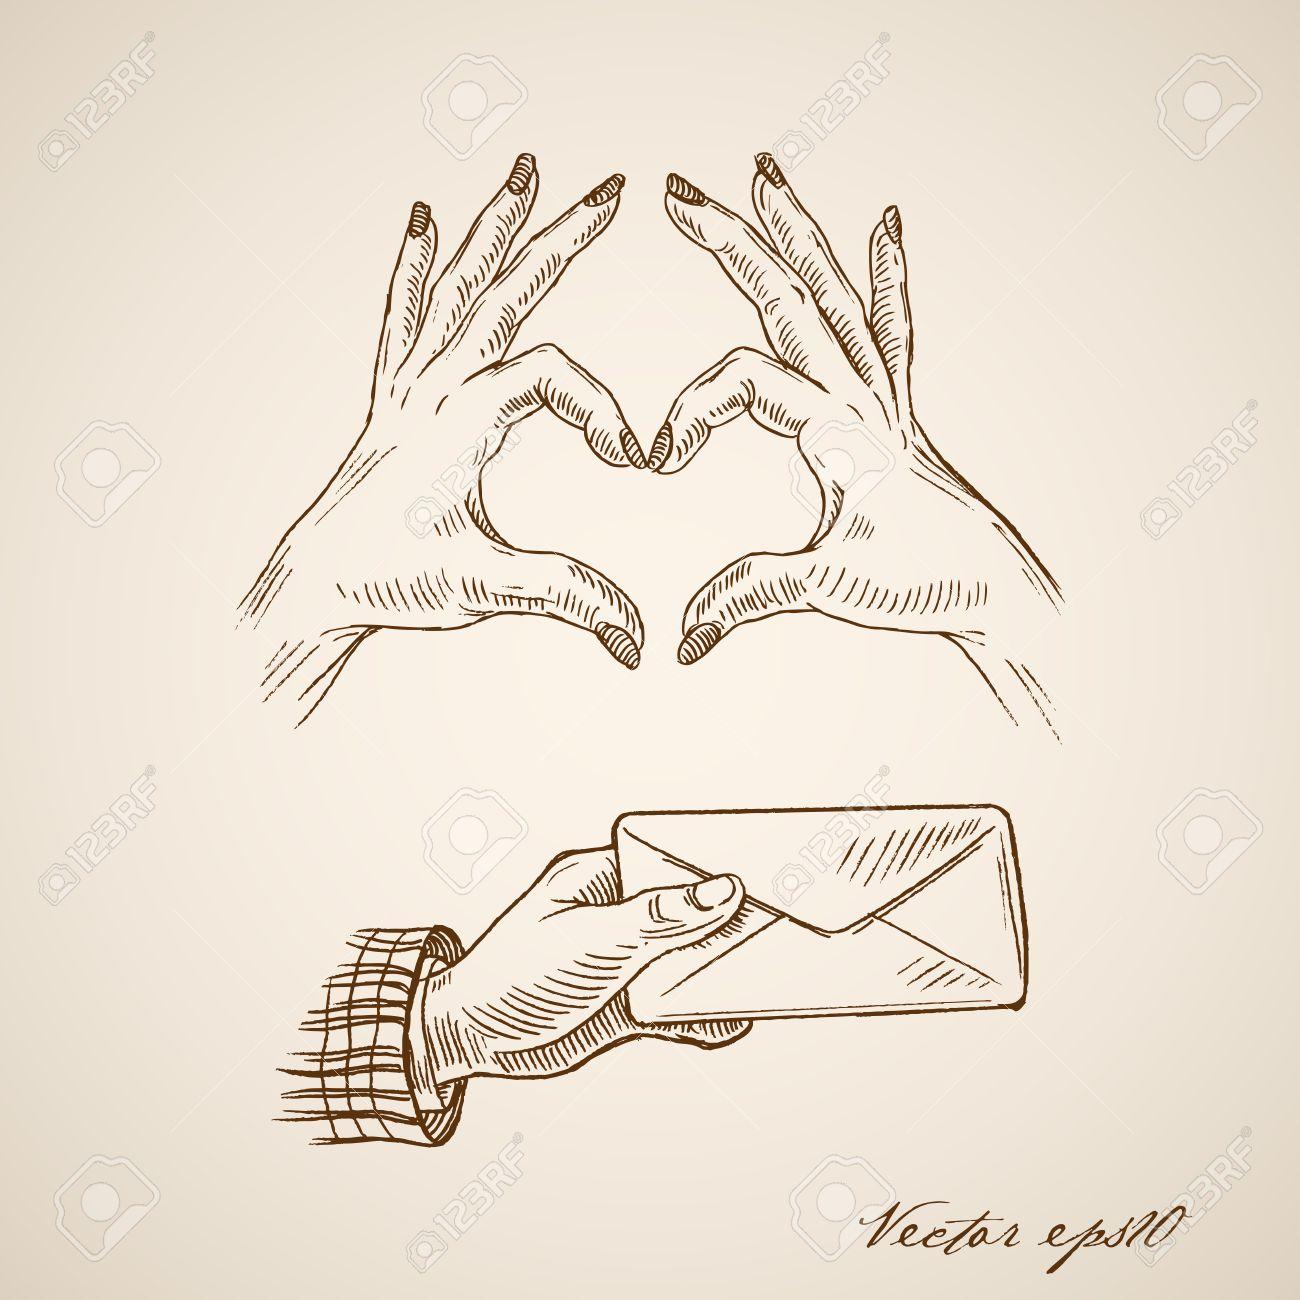 Engraving Vintage Hand Drawn Female Hands Making Heart Symbol